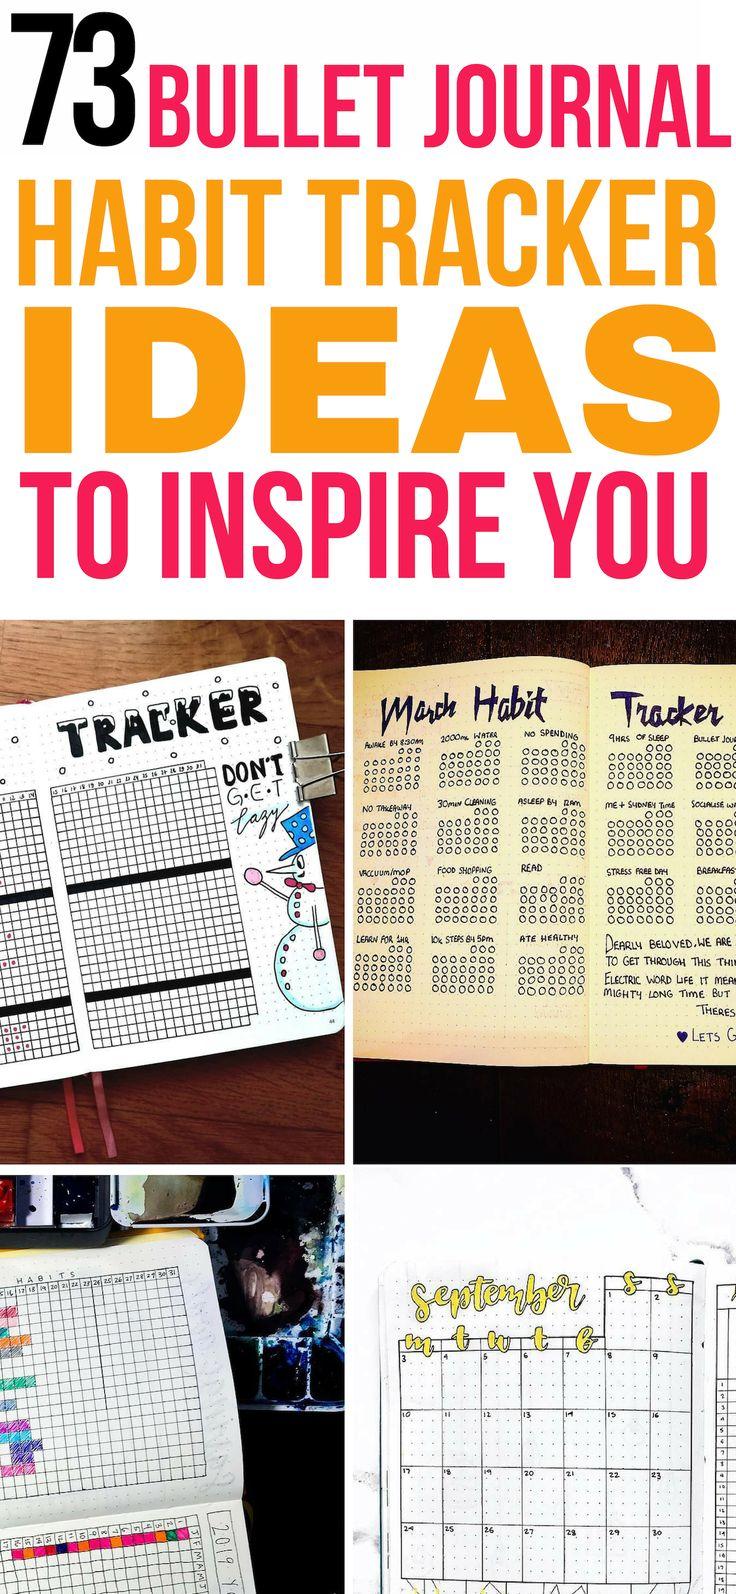 Bullet journal habit tracker ideas to inspire! These amazing bullet journal habi…